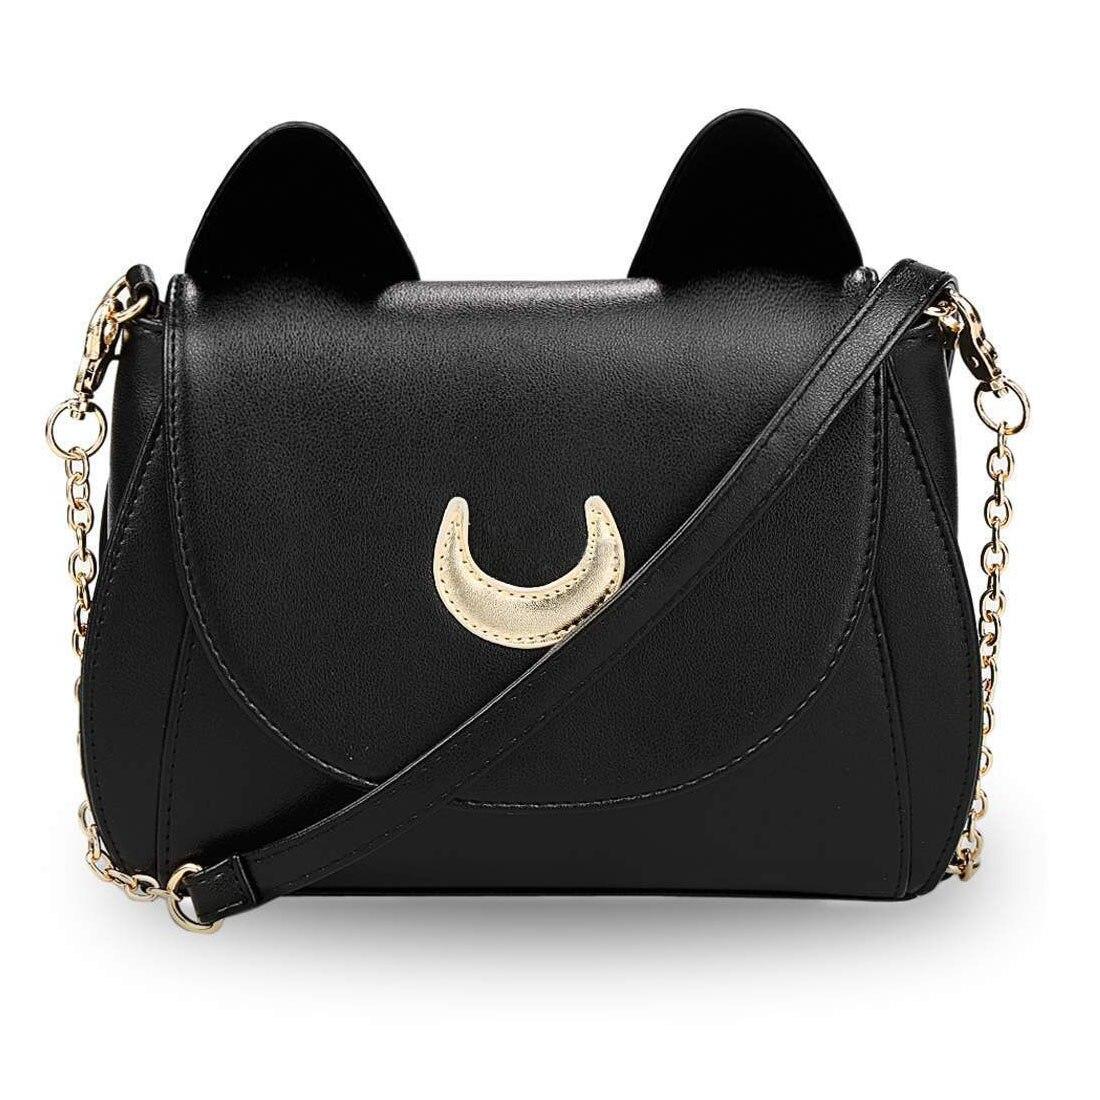 2c57f5b13c 2017 New Summer Limited Sailor Moon Chain Shoulder Bag Ladies Luna Cat PU  Leather Handbag Women